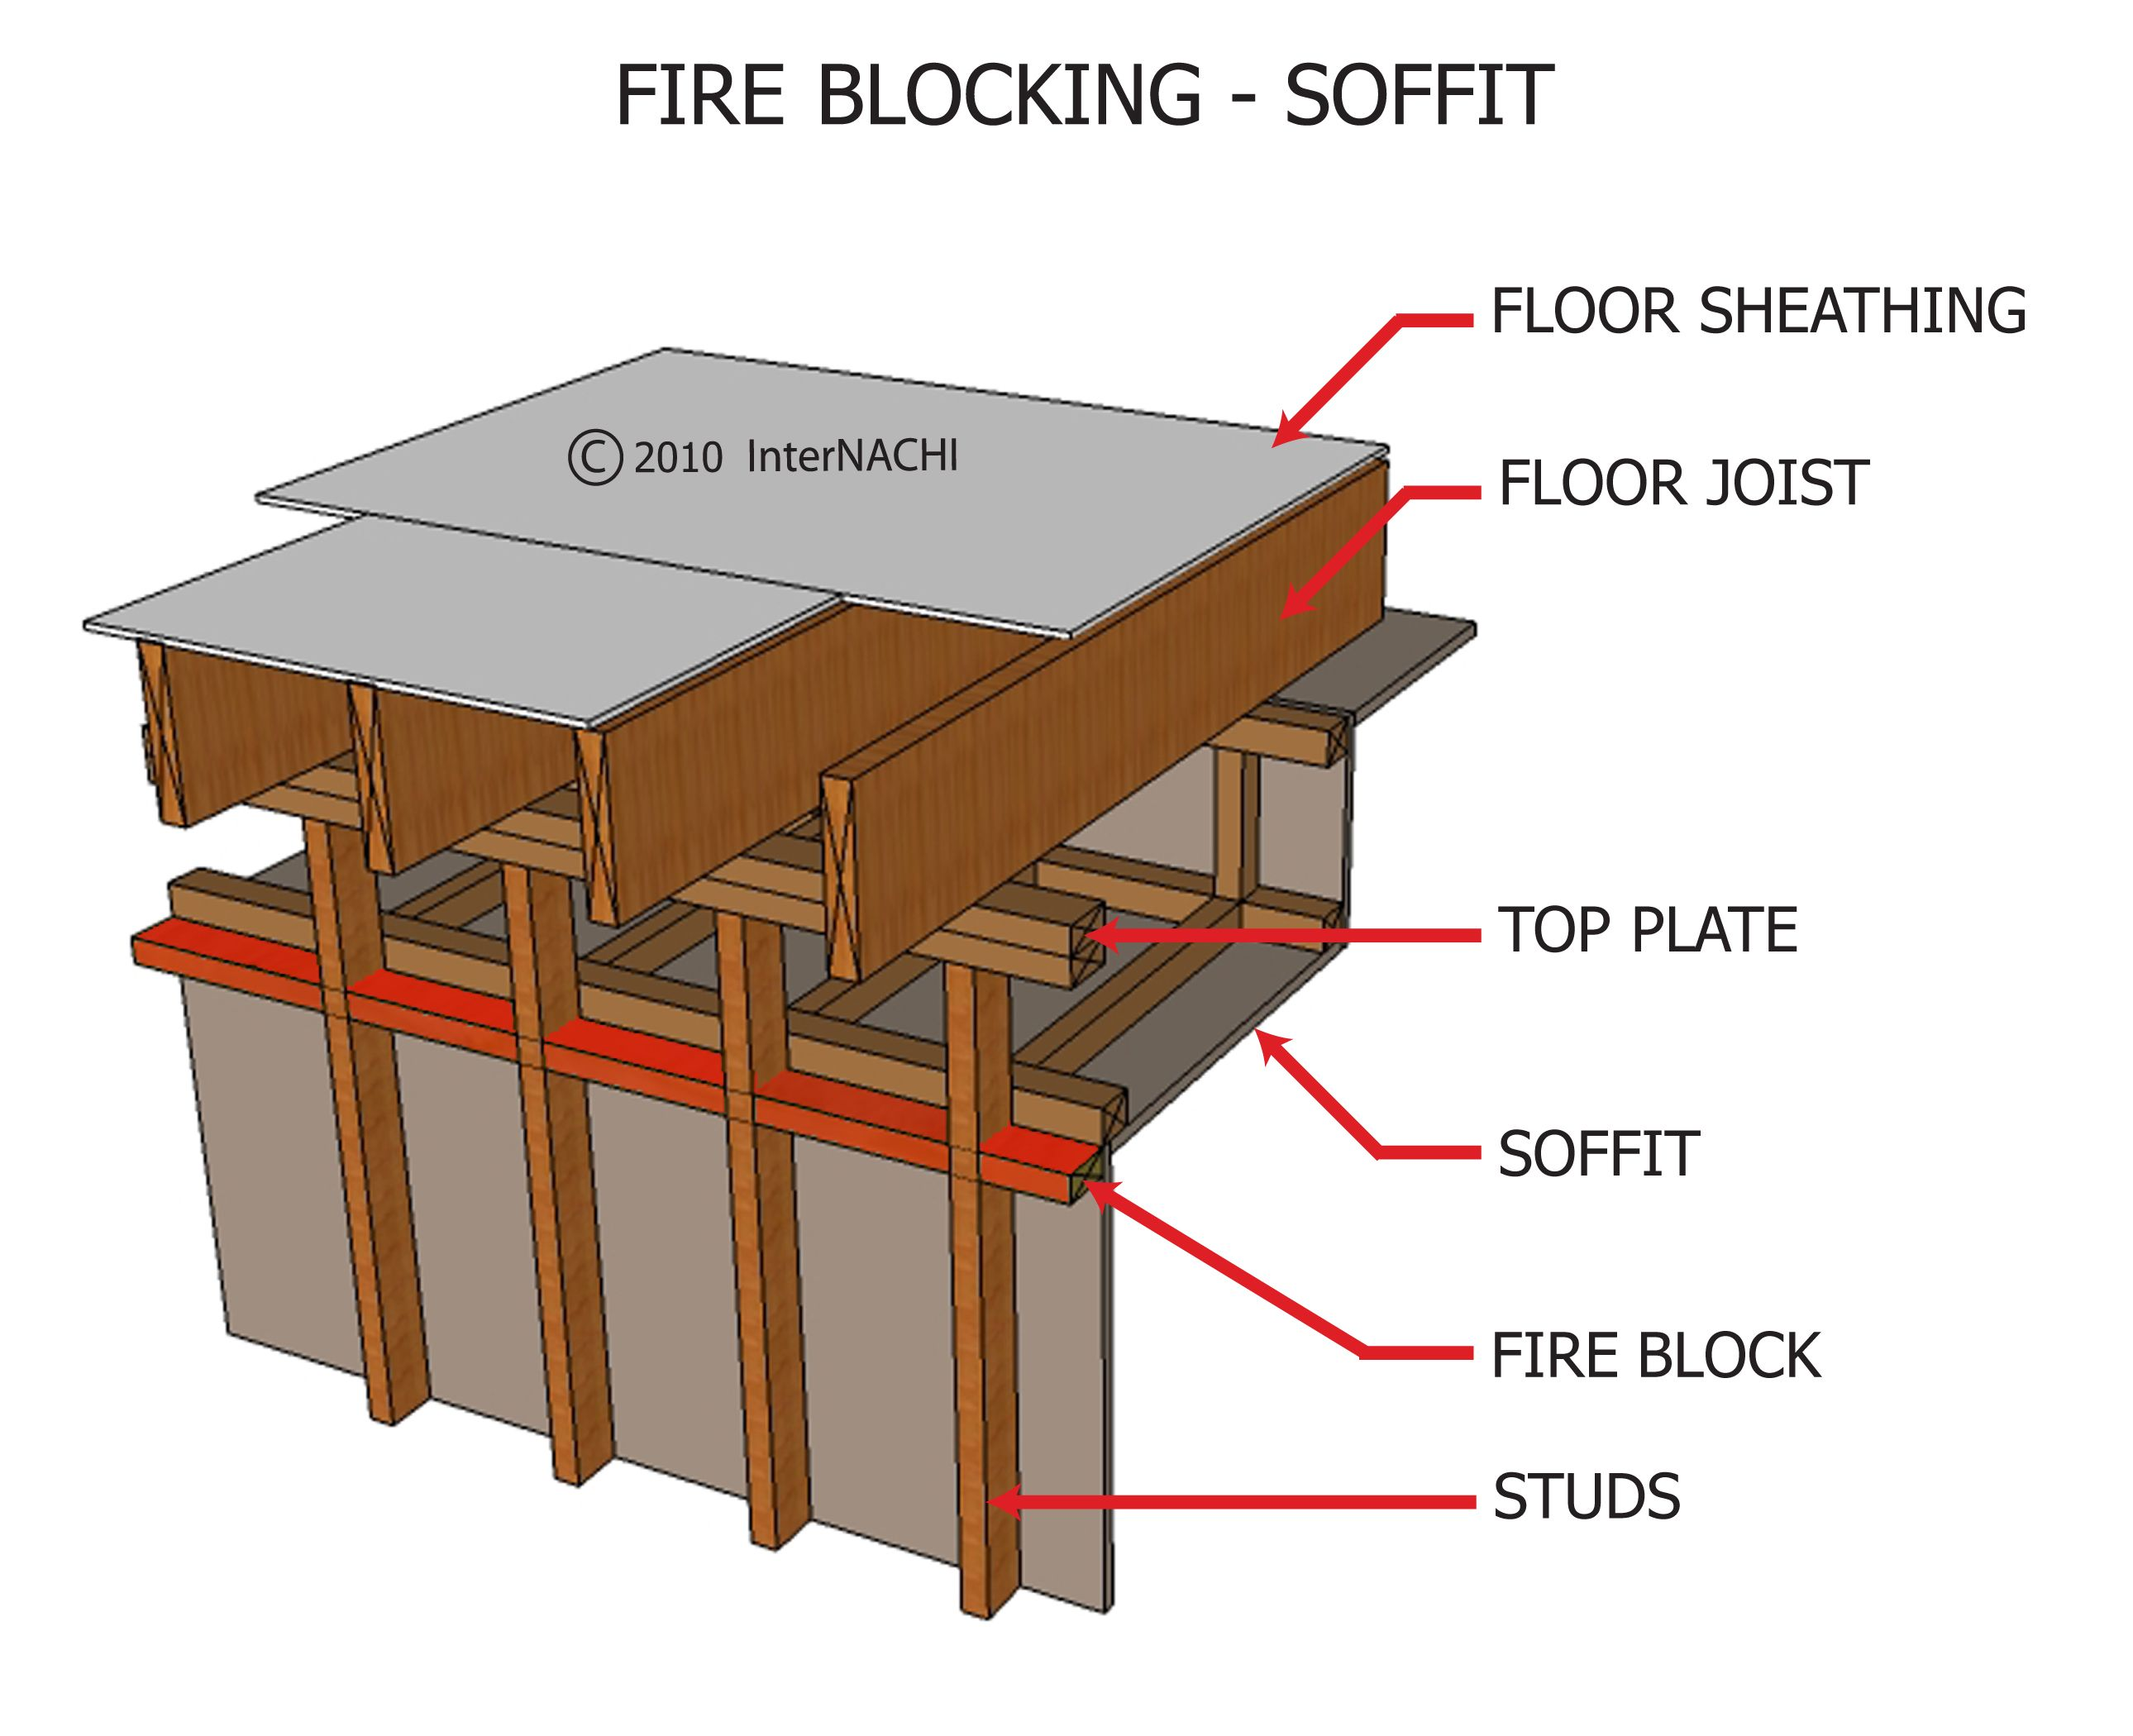 Fire Blocking Google Search Fire Blocking Fire Search Google